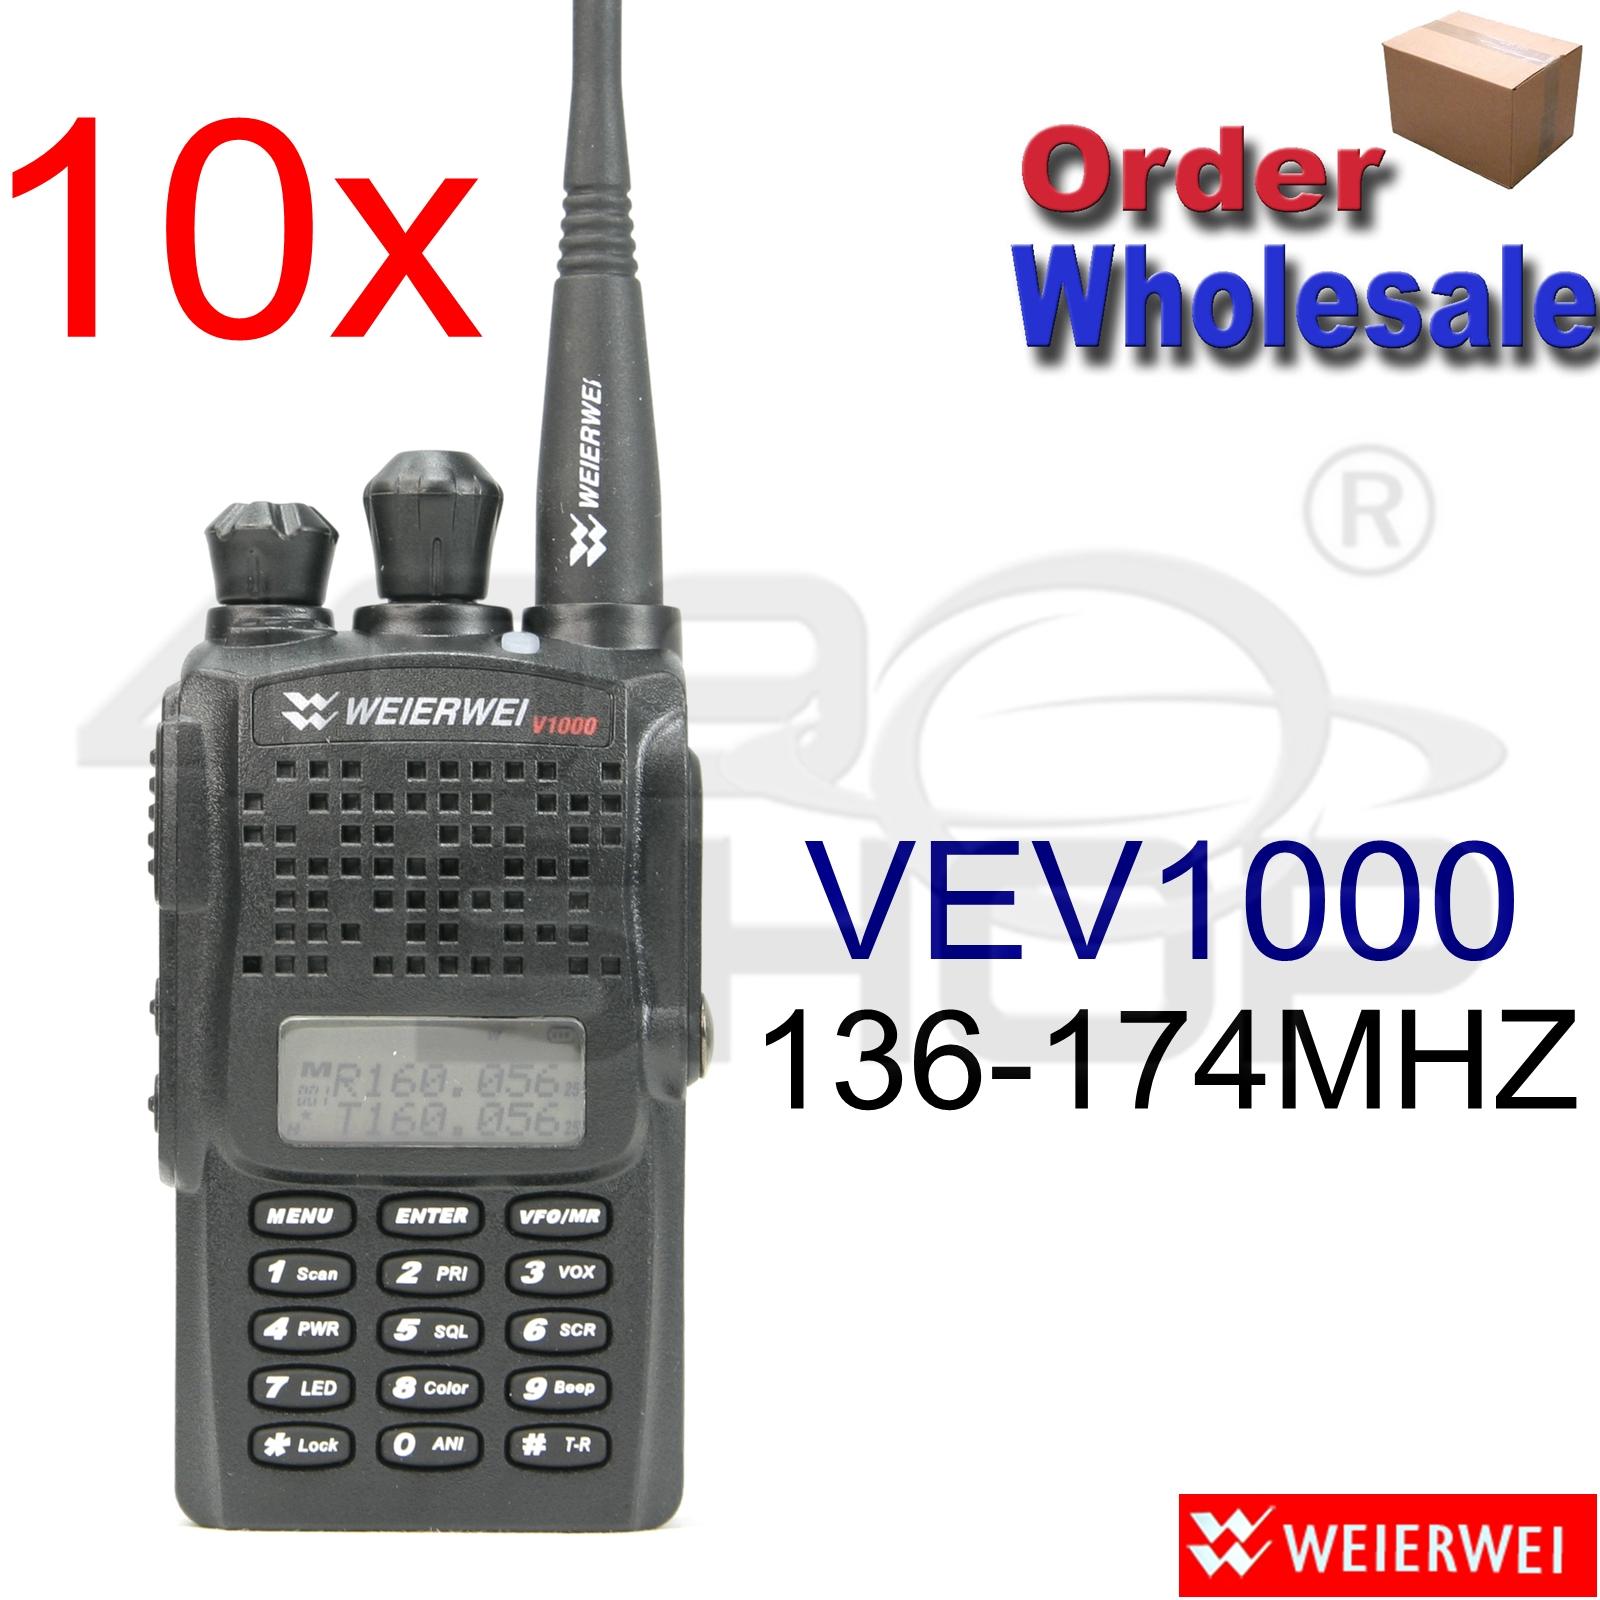 https://pic.409shop.com/photo/VEV1000V_wholesale.jpg